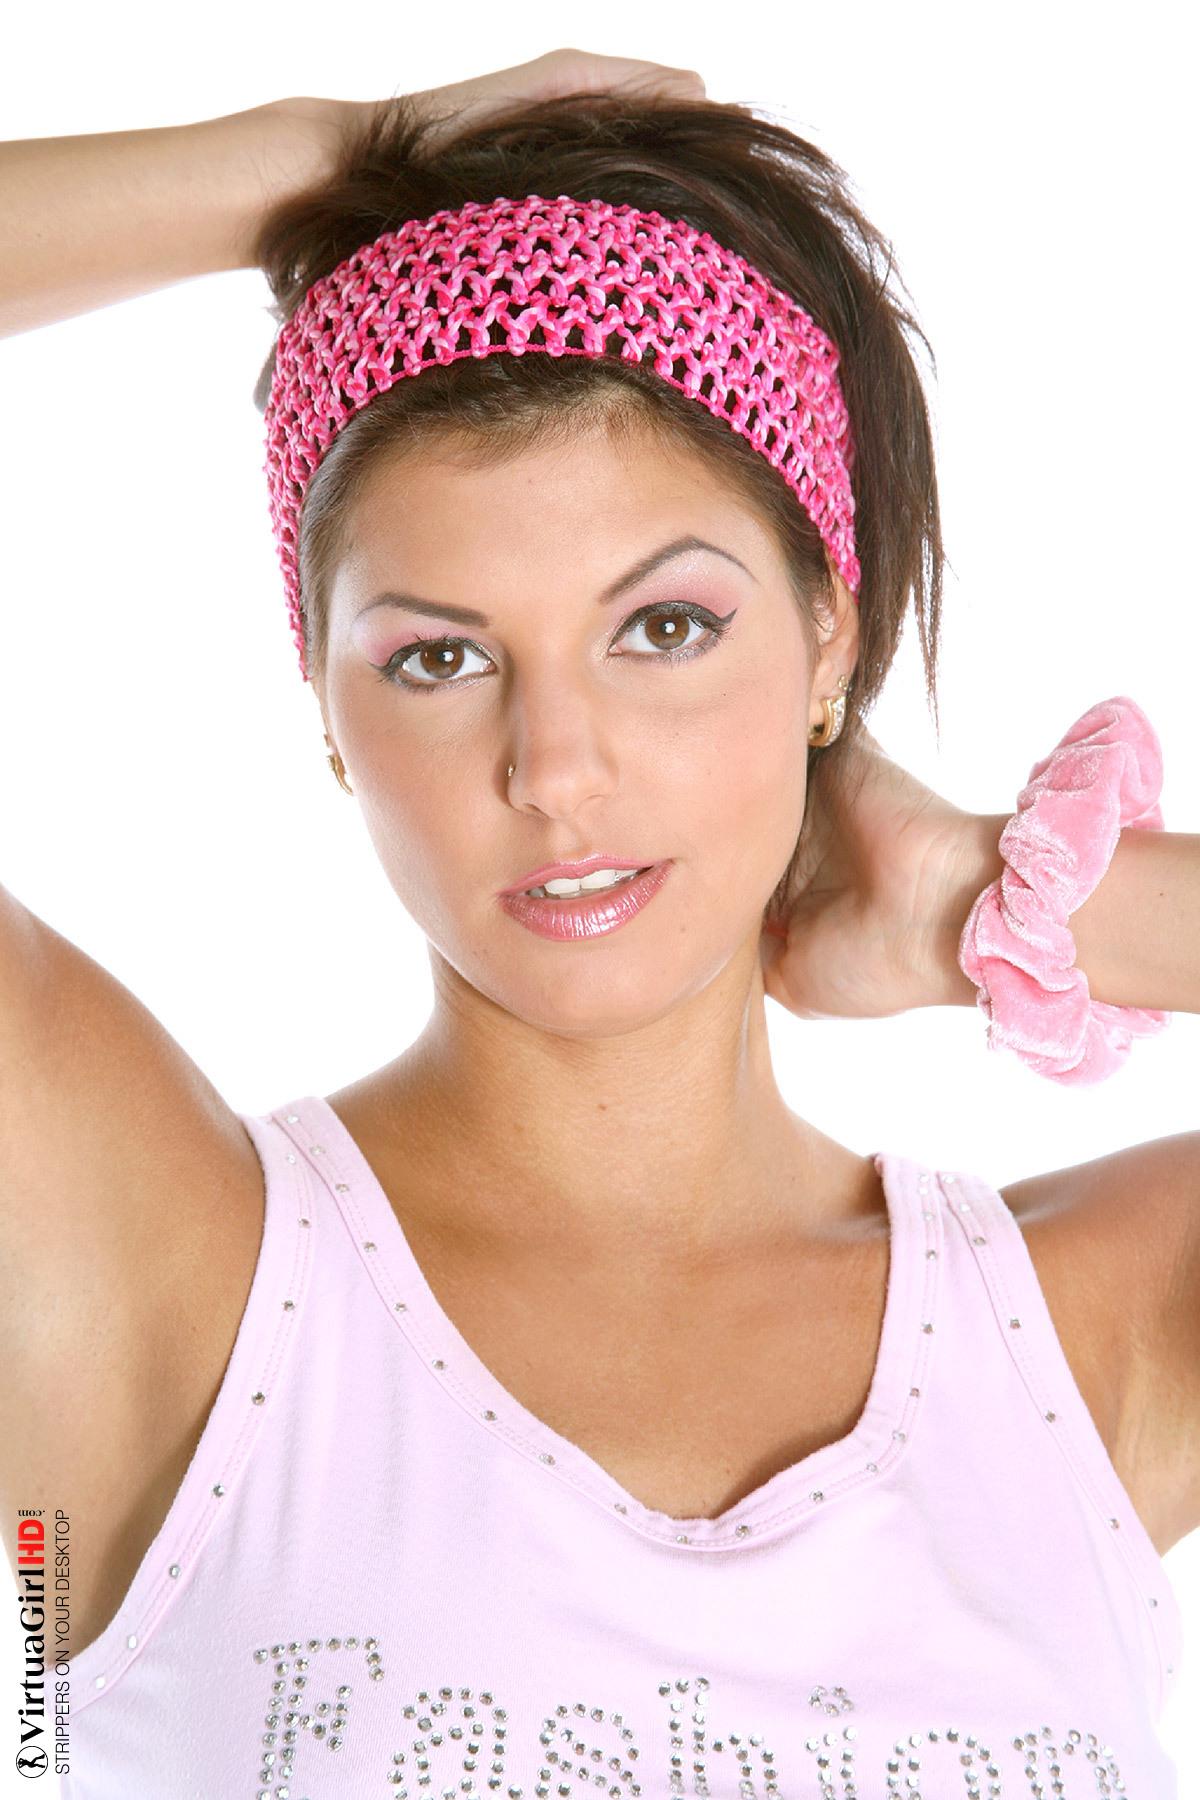 hot girl striptease sexy nude poledance desktop stripper cosmid - mary jane